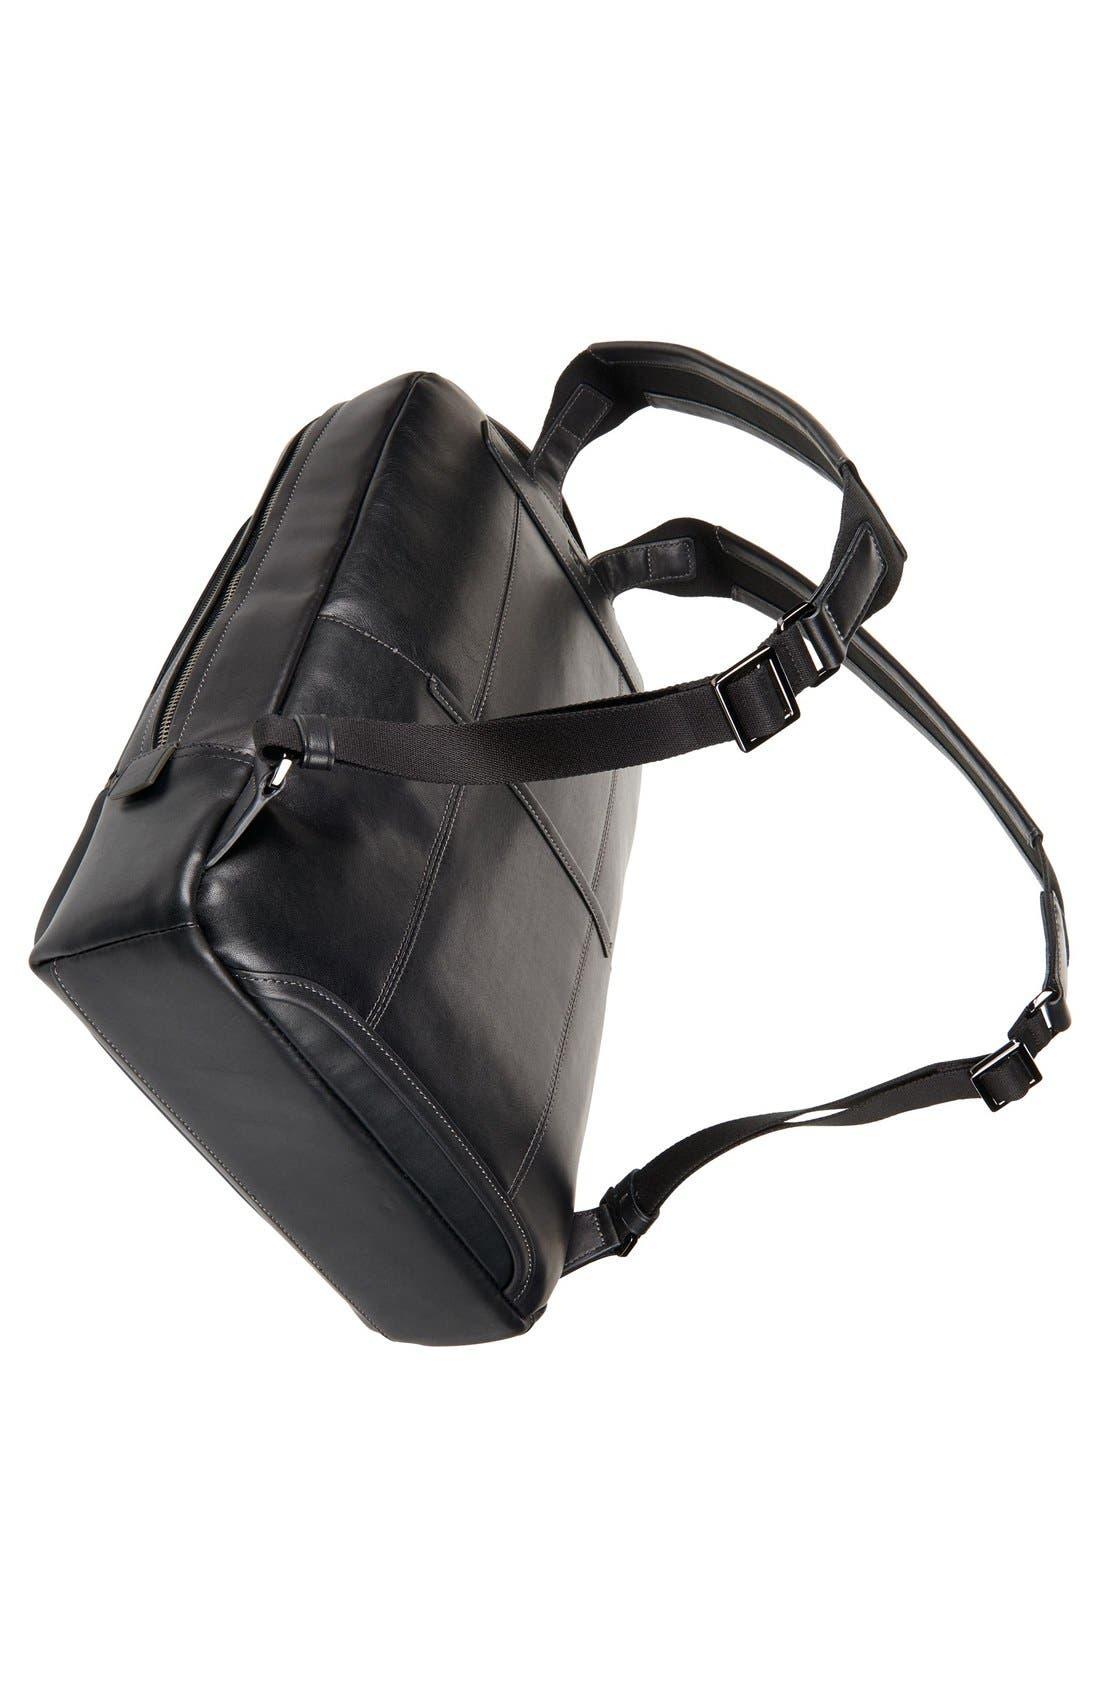 'Harrison - Bates' Leather Backpack,                             Alternate thumbnail 5, color,                             Black